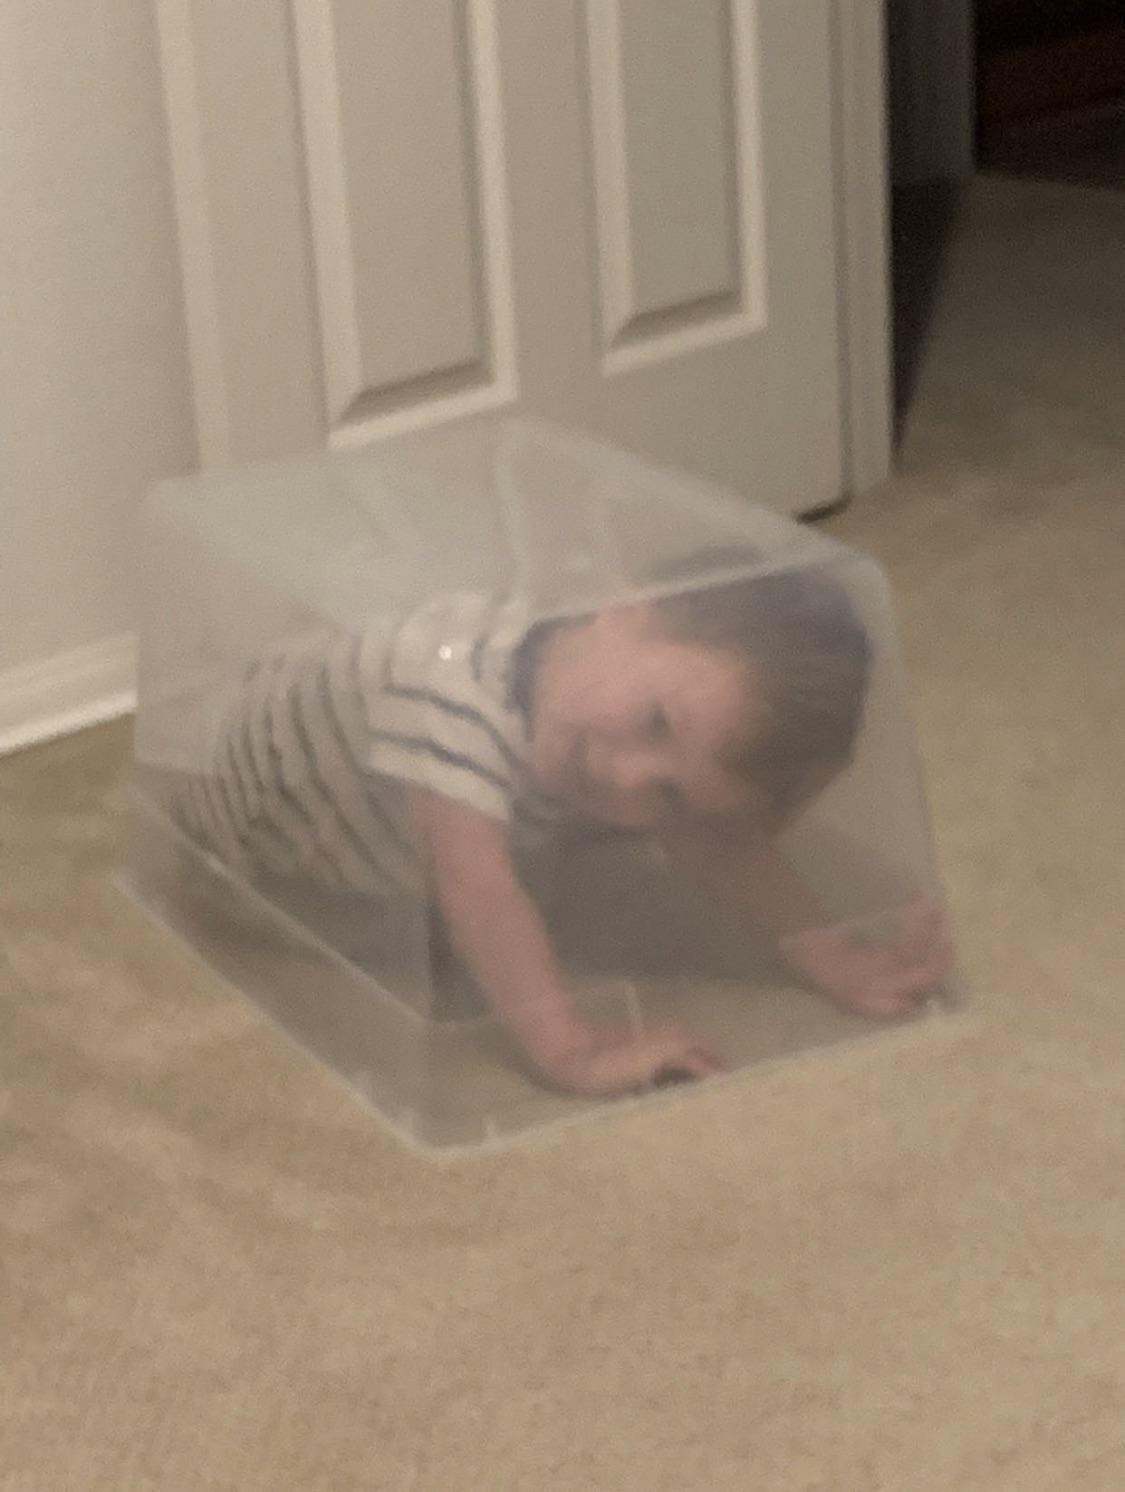 We're playing hide and seek